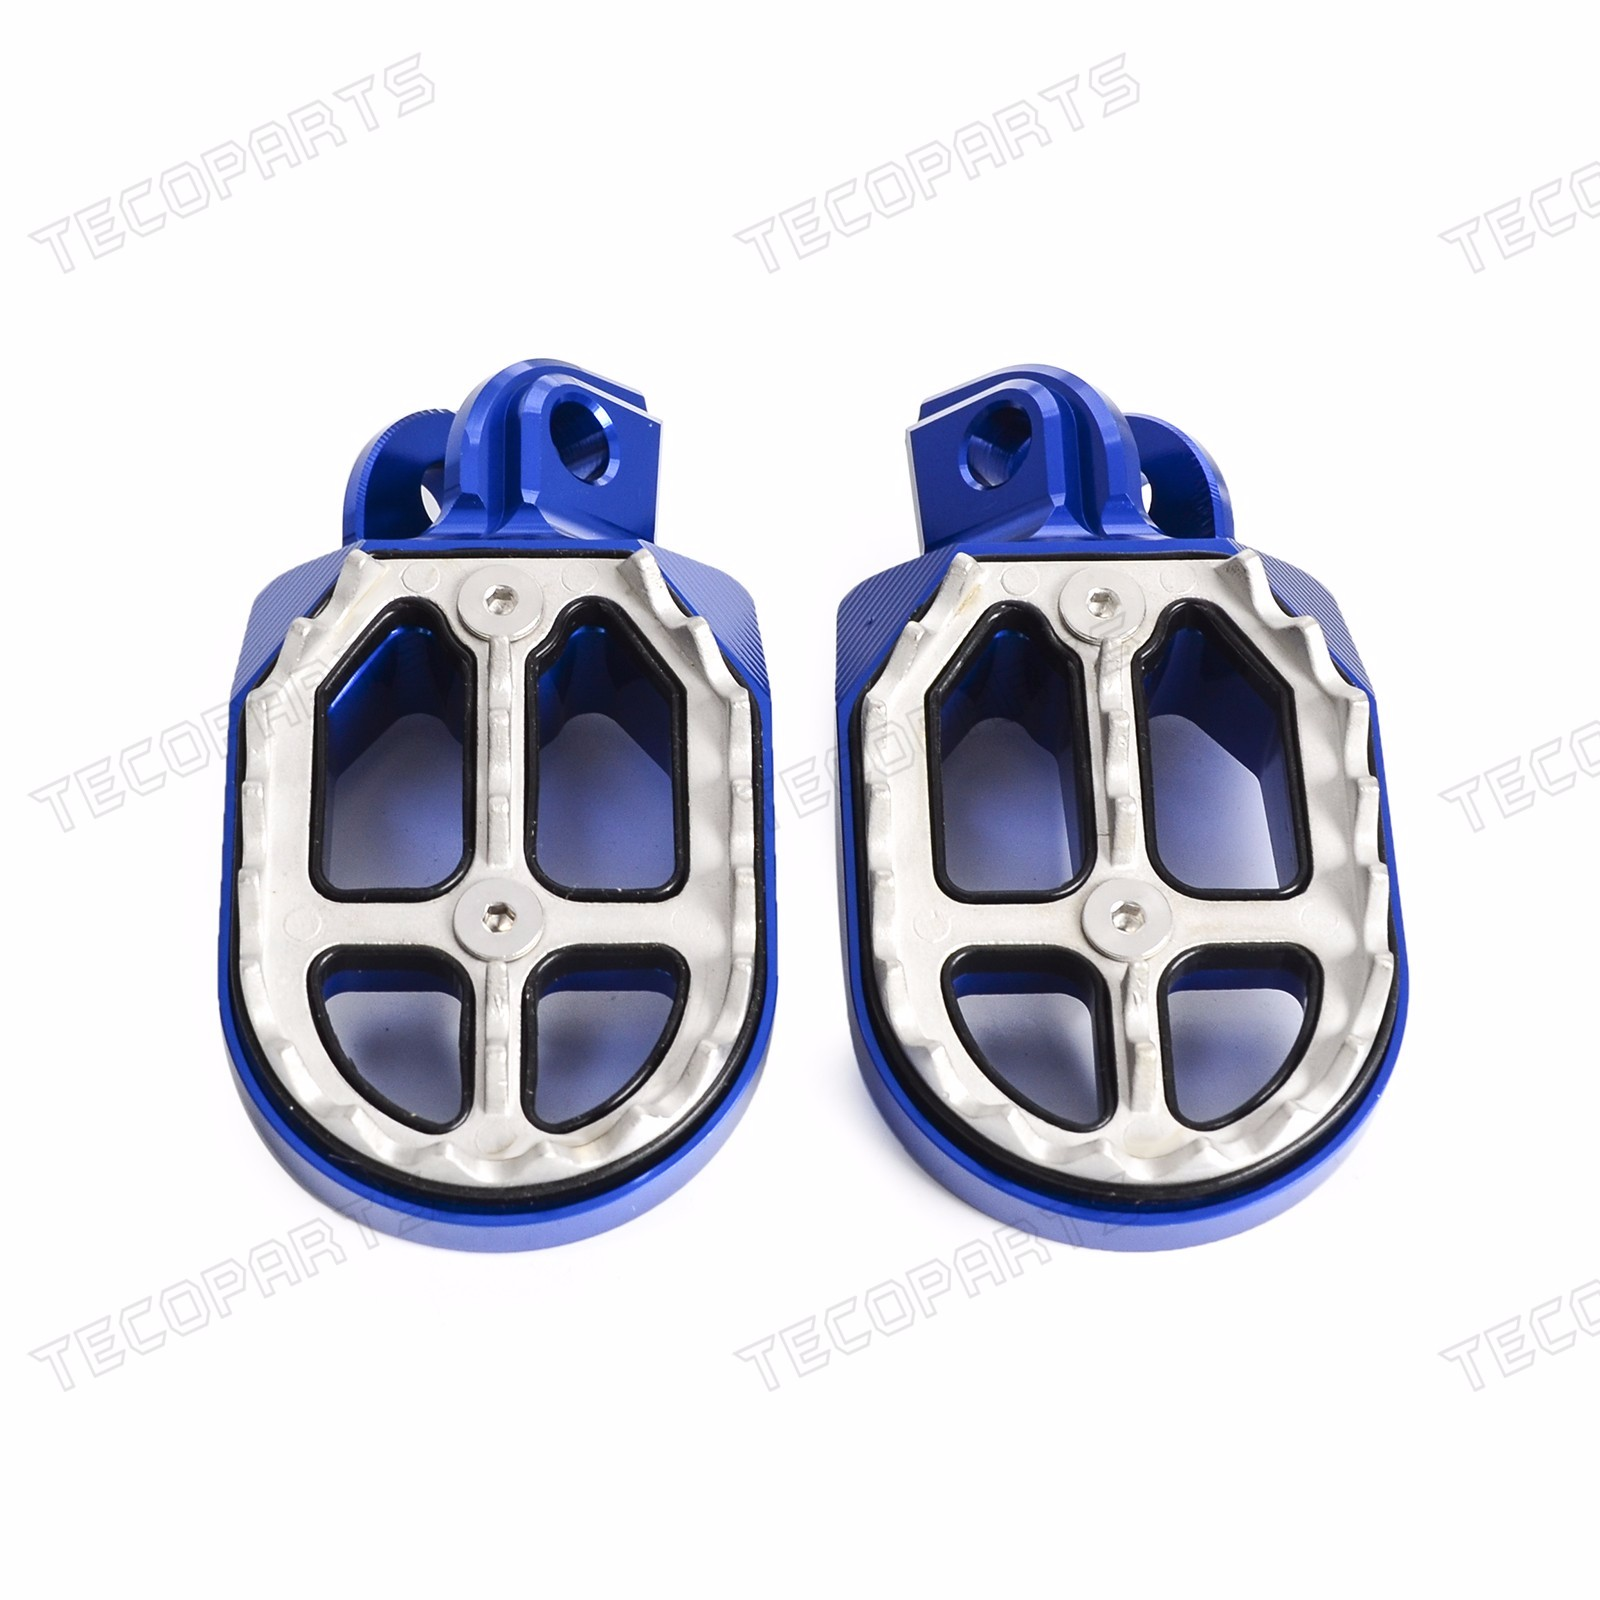 MX CNC Wide Fat Foot Pegs Footrests For HUSQVARNA TE/FE150-501 TC250 ...